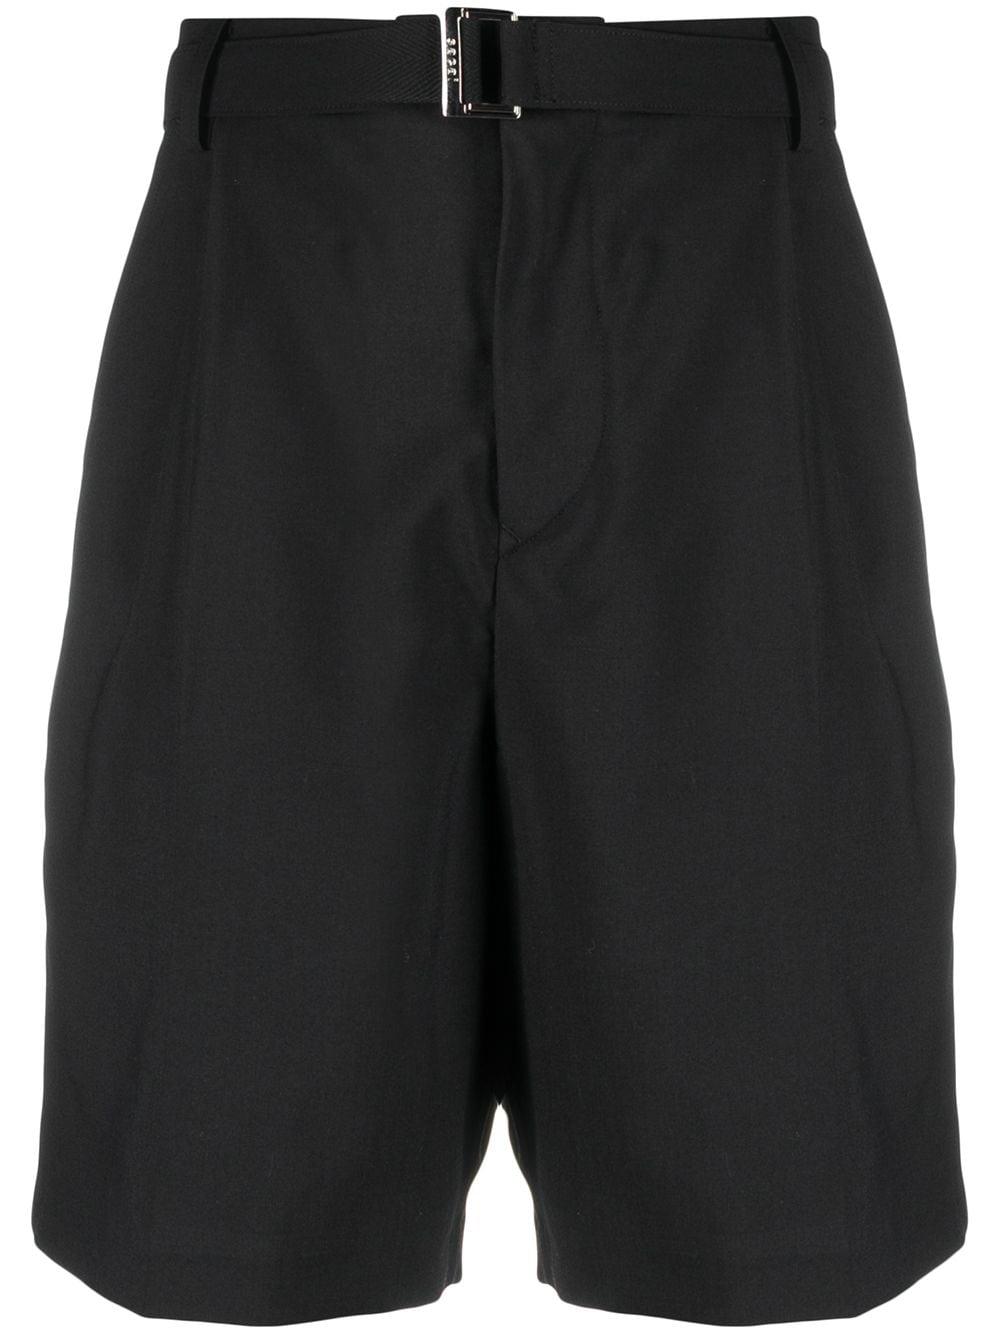 Shorts con cintura e fasce laterali in raso SACAI | Shorts | 21-02462M001